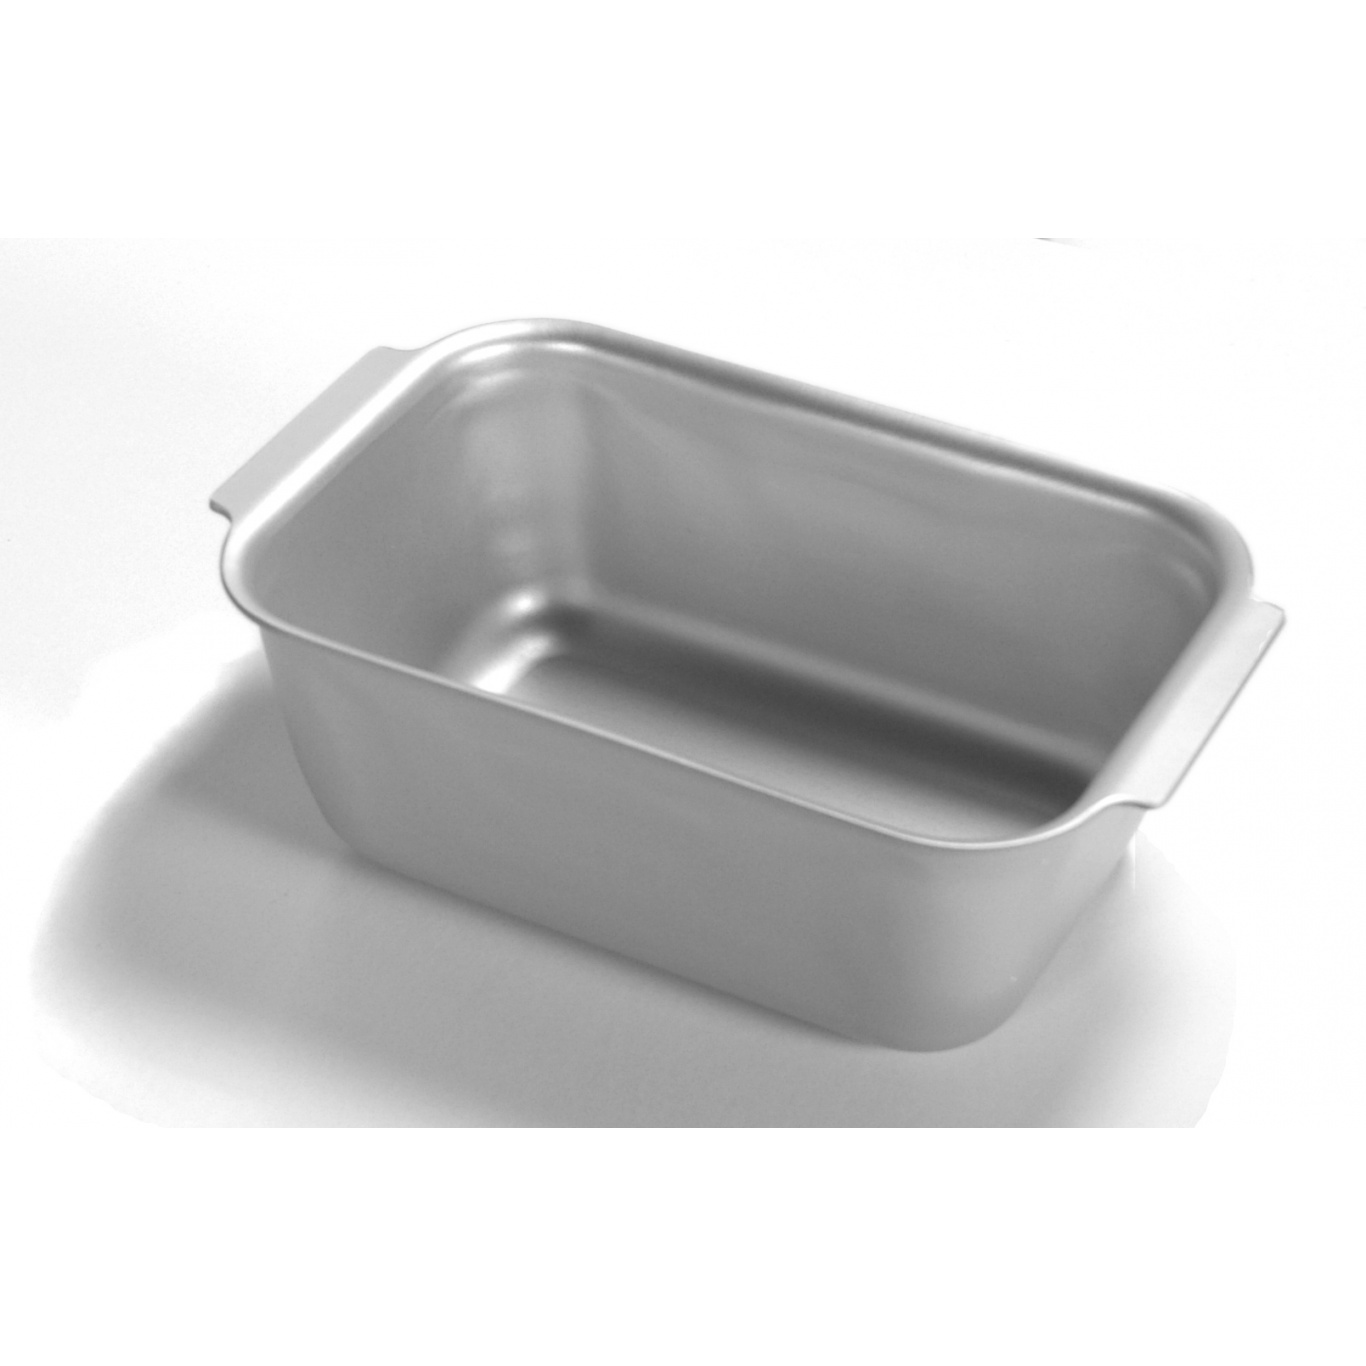 Image of Silverwood Loaf Pan 450grms/1lb